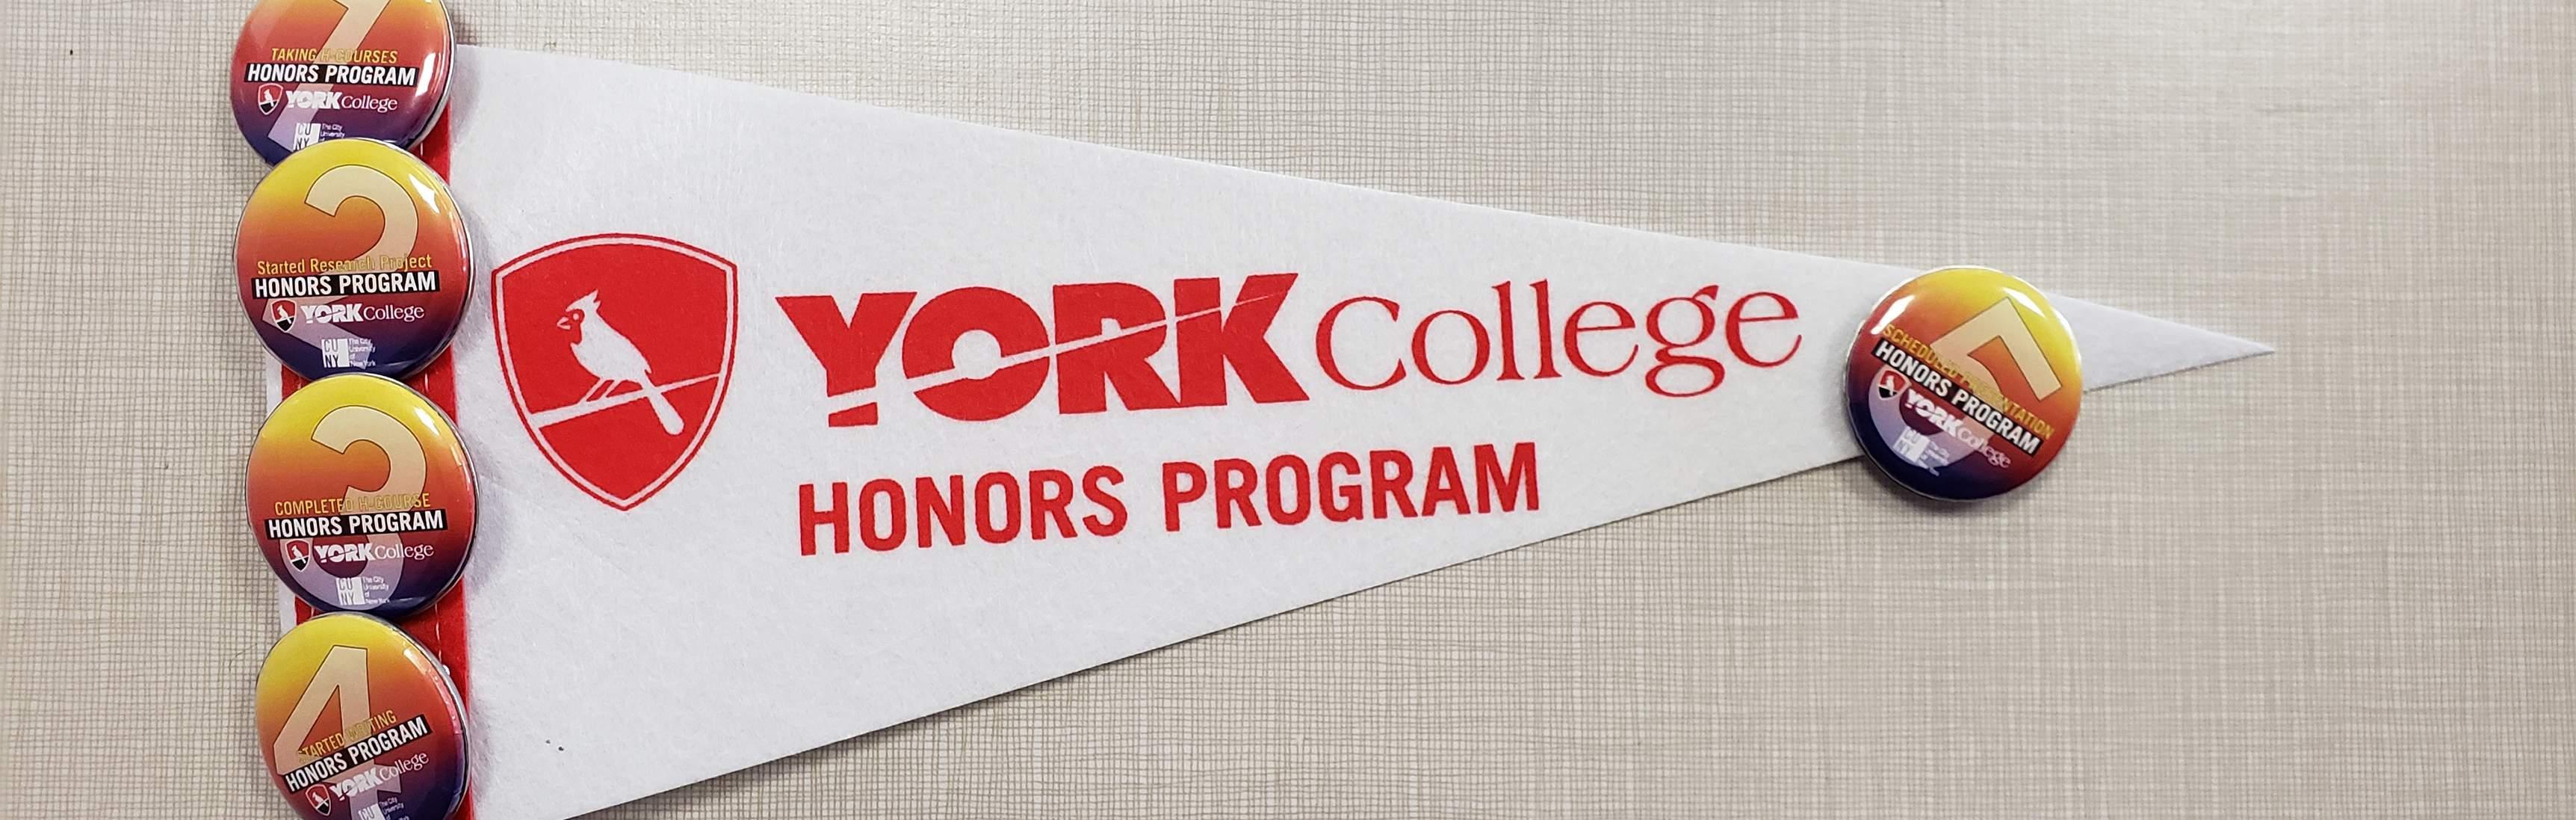 York College Honors Program